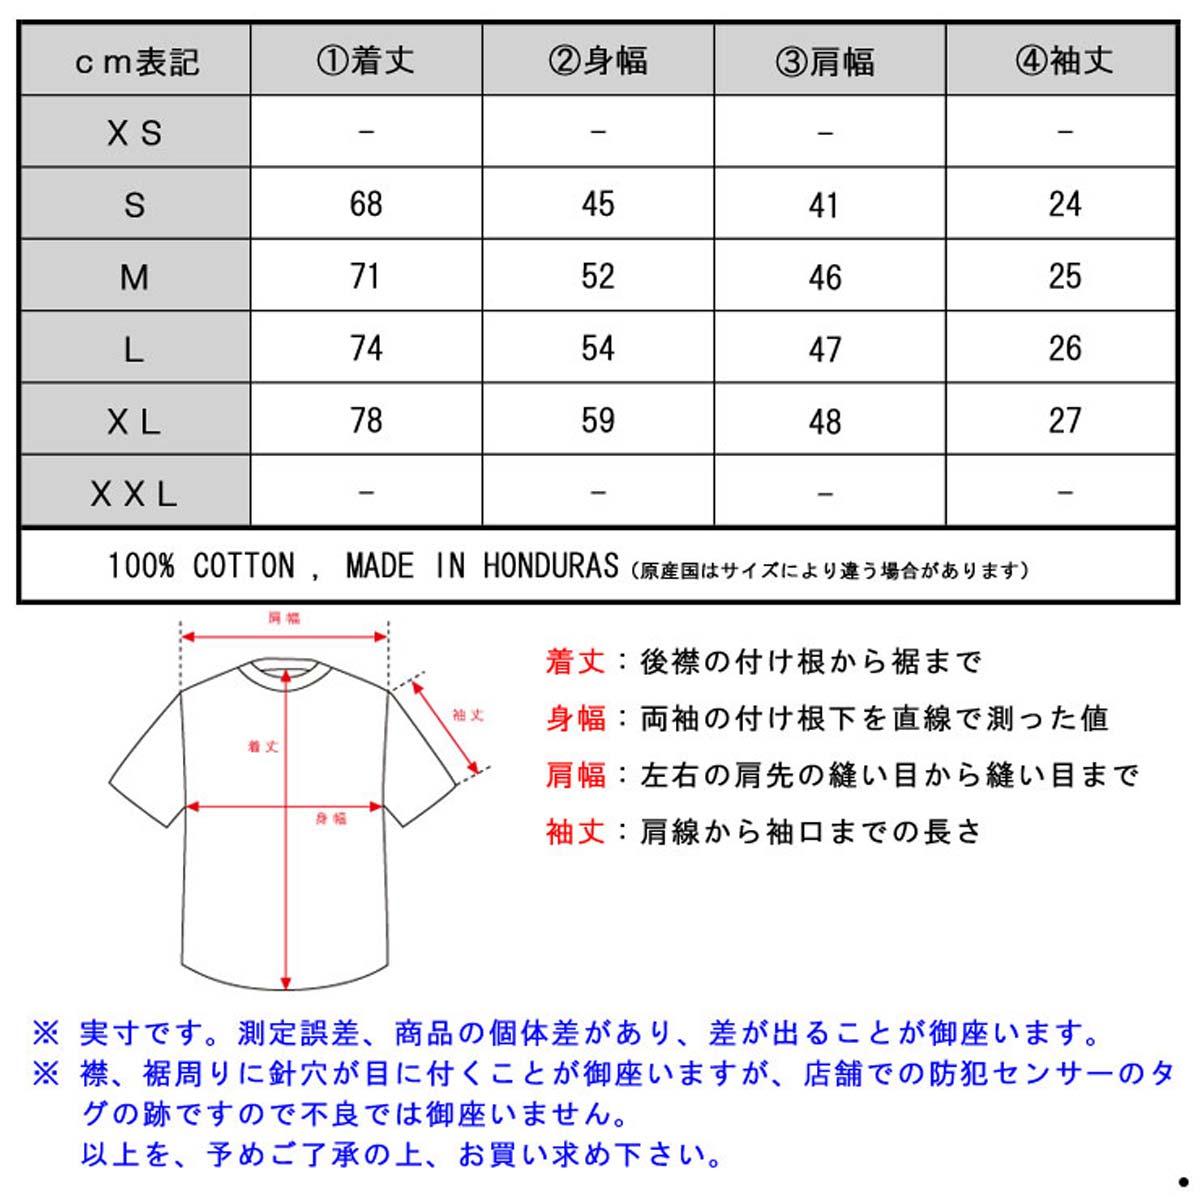 c7342ab4 チャンピオン CHAMPION 正規品 メンズ 半袖Tシャツ CREW TEE T1919 Heritage Tee 806-OXFORDGREY